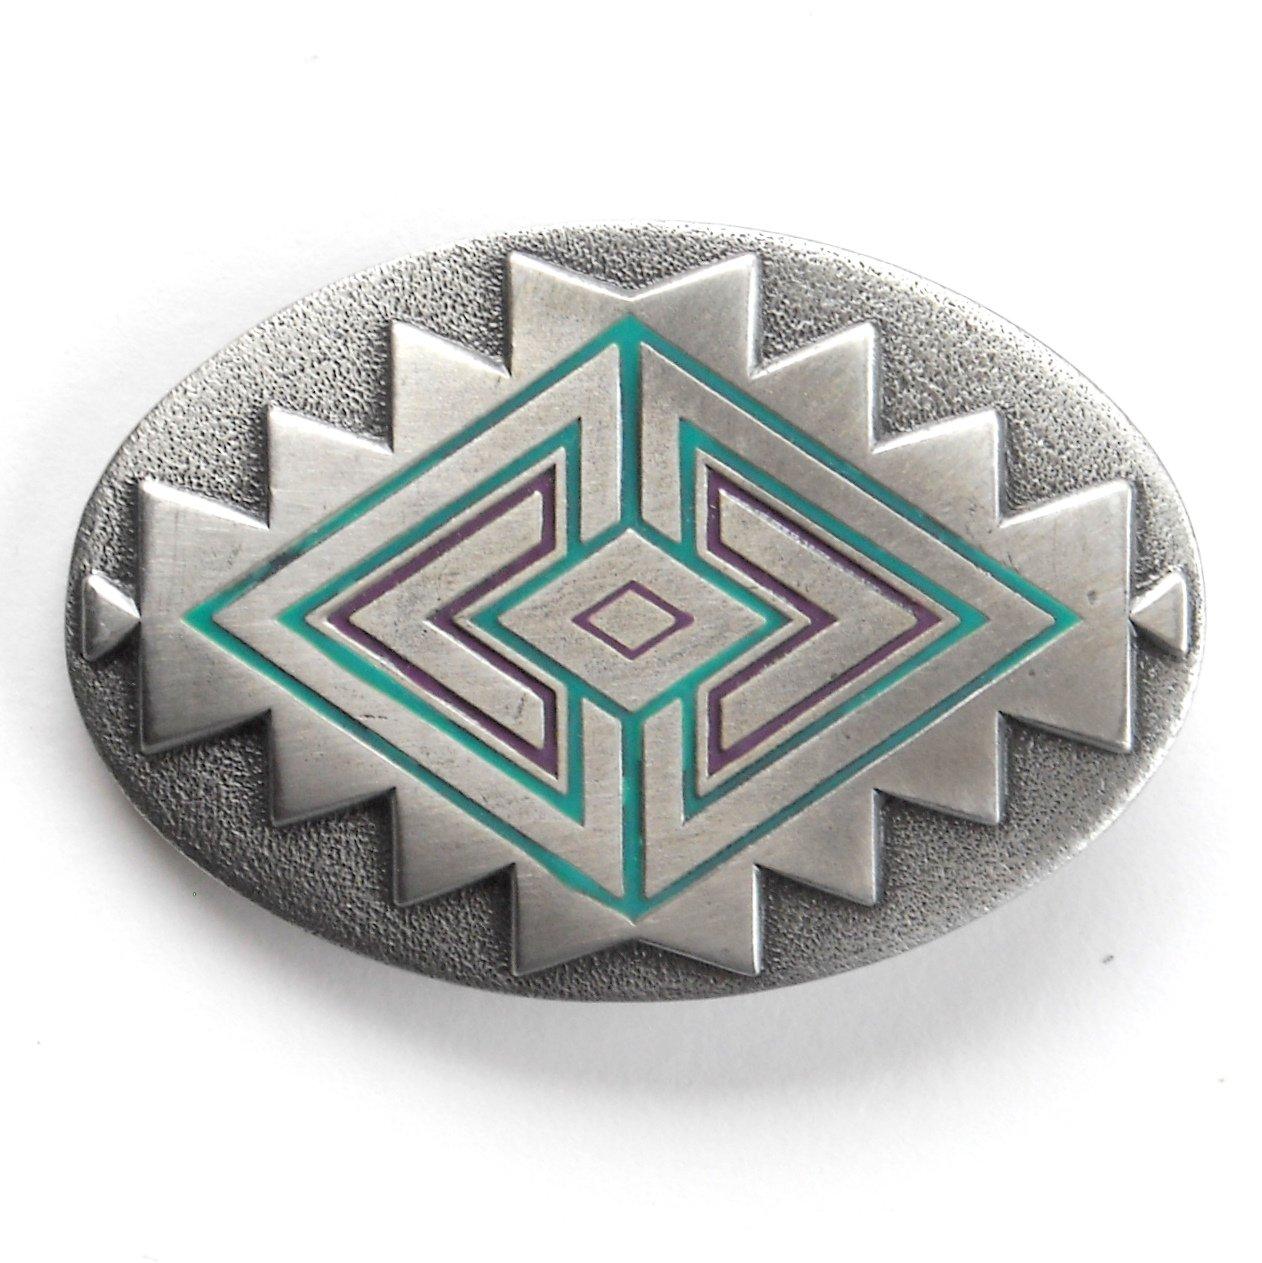 Southwest Native American Design Great American GAP Belt Buckle